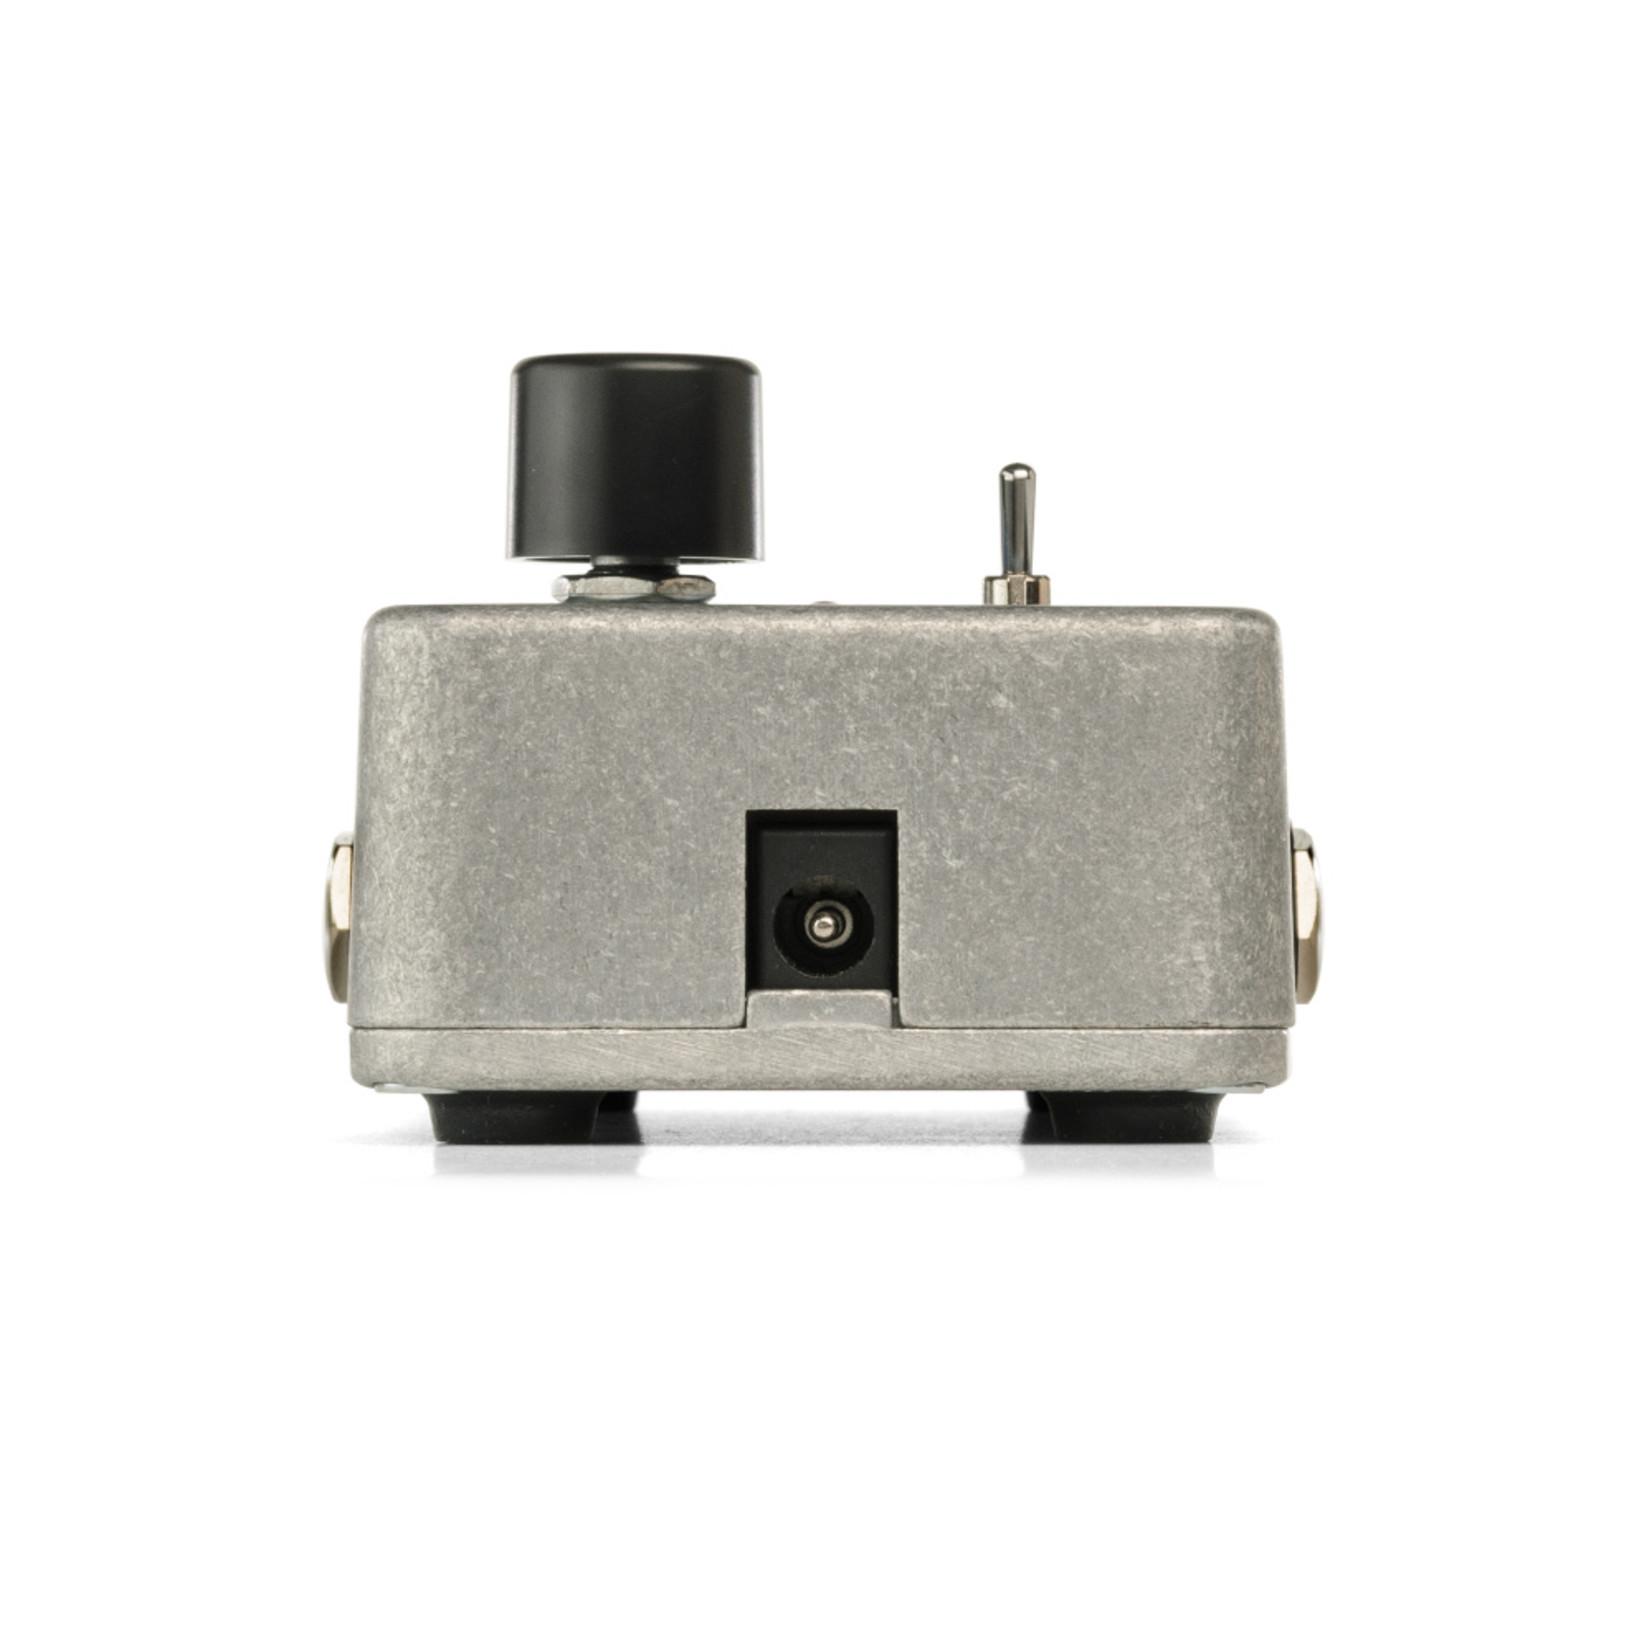 Electro-Harmonix Electro-Harmonix 5MM Power Amp, Pocket-Sized Amplifier